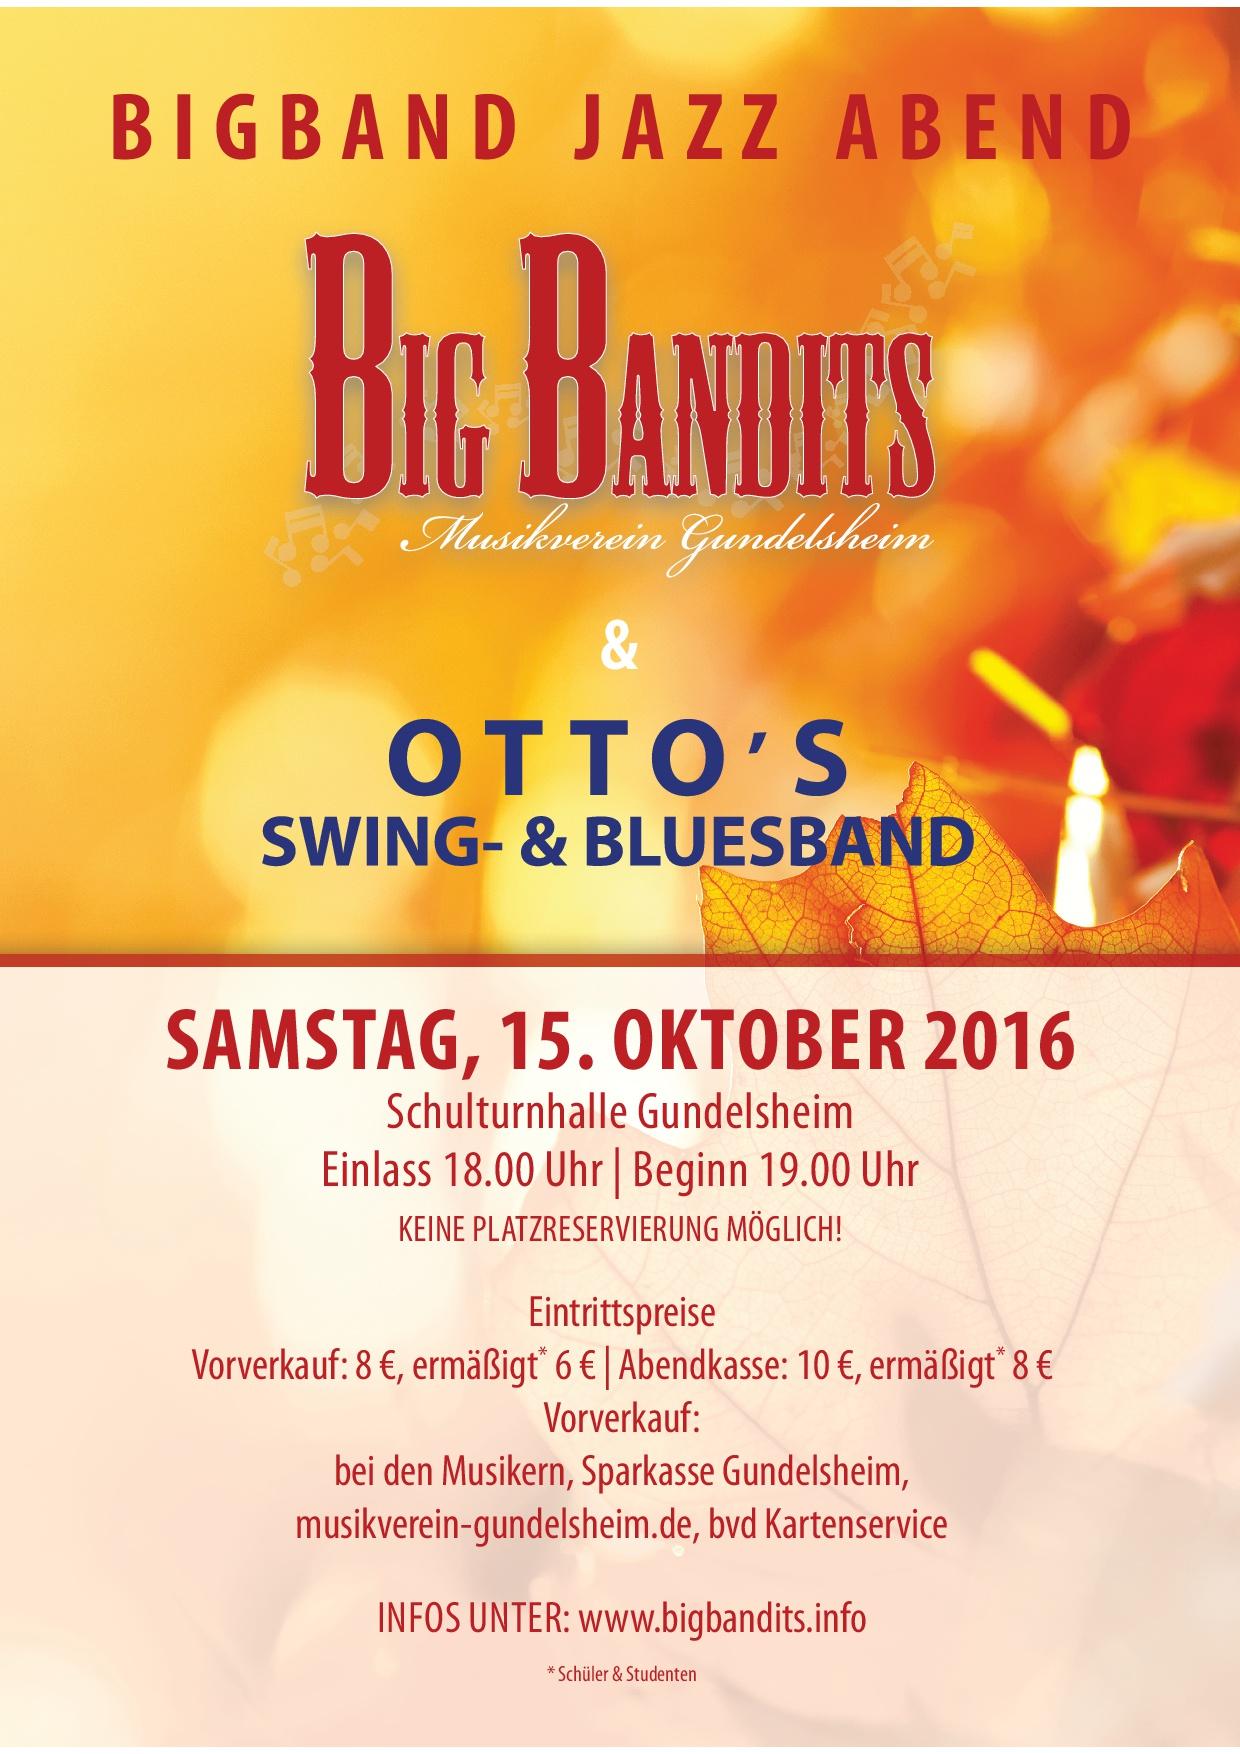 bigband-veranstaltung_2016-10-15_a4